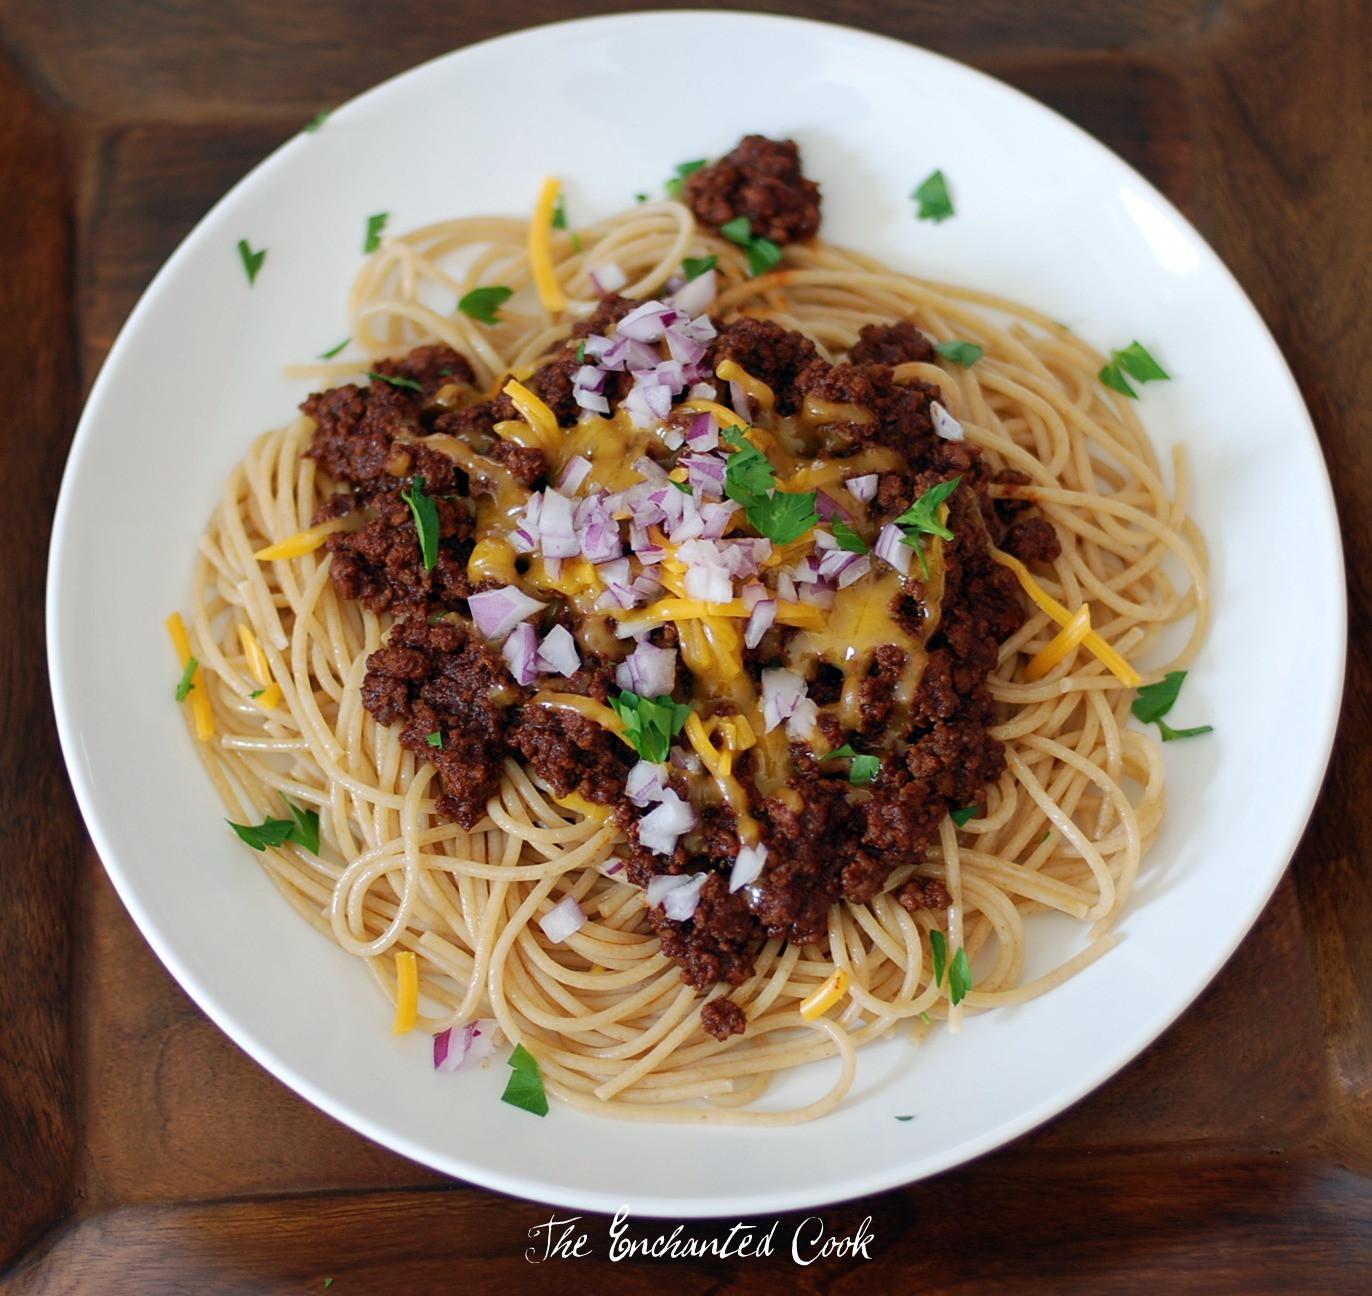 Chili On Spaghetti  The Enchanted Cook Beer Chili Spaghetti